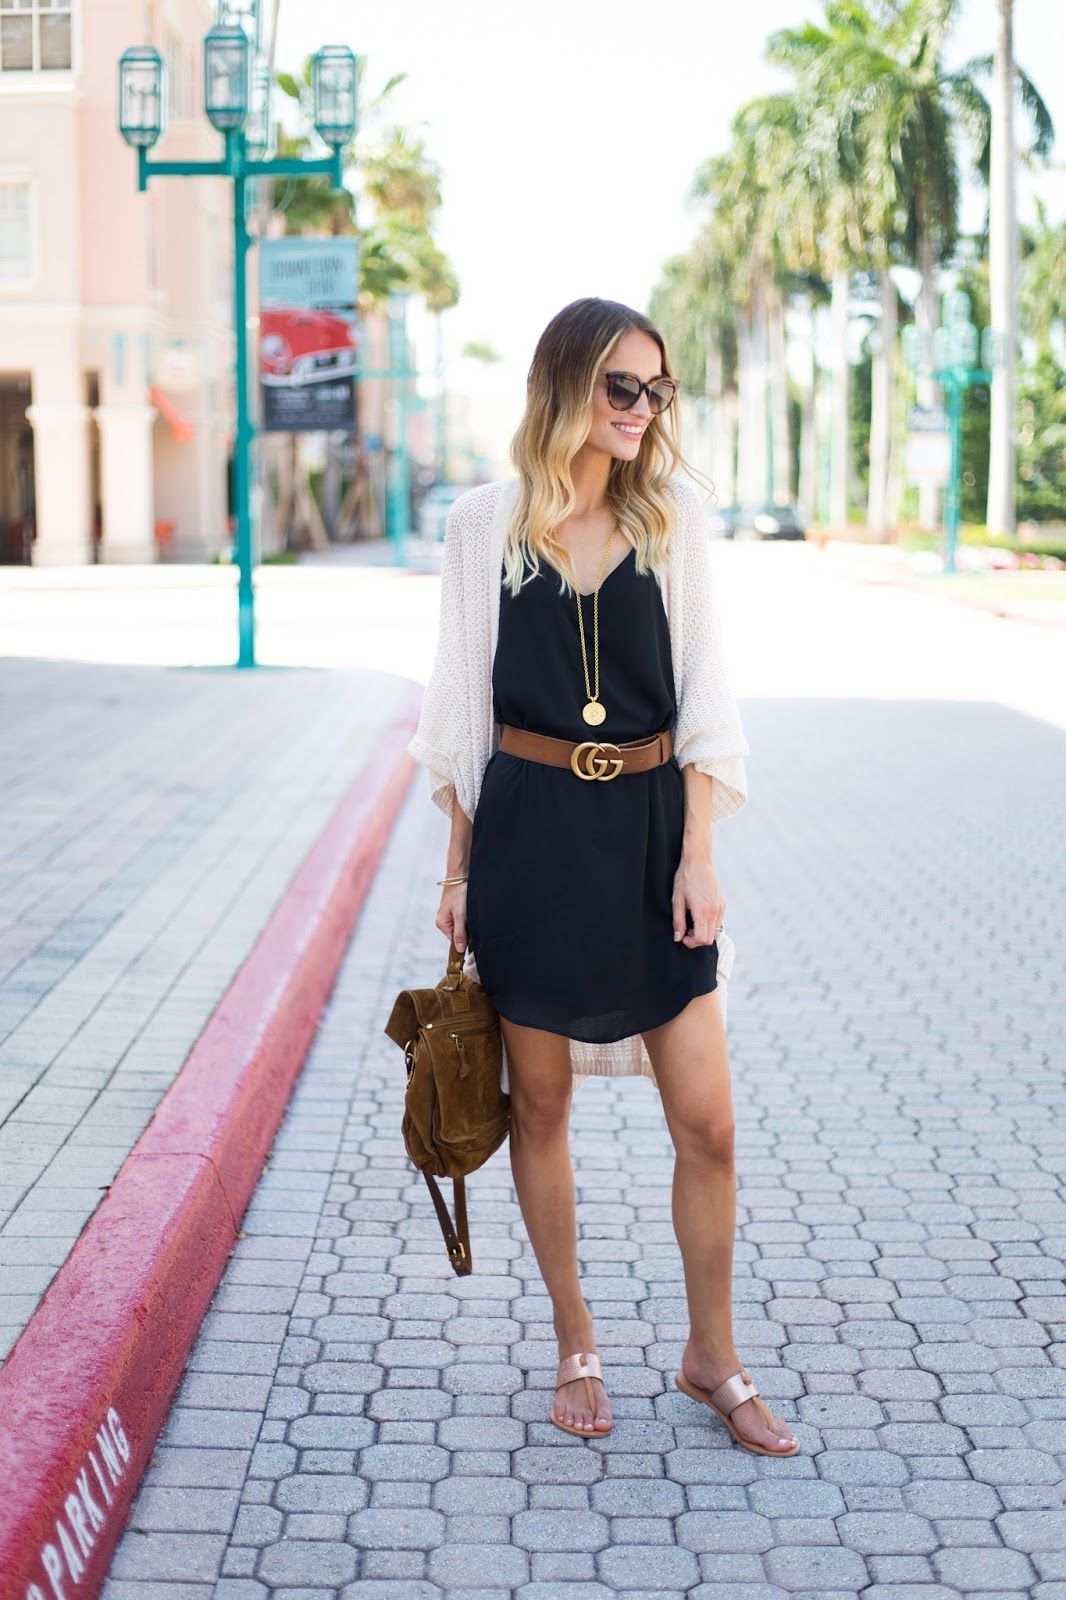 Slip Dress Gucci Belt Oversized Knit Cardigan Effortless Summer Style Summer Slip Dress Summer Fashion Outfits Summer Dress Outfits [ 1600 x 1066 Pixel ]